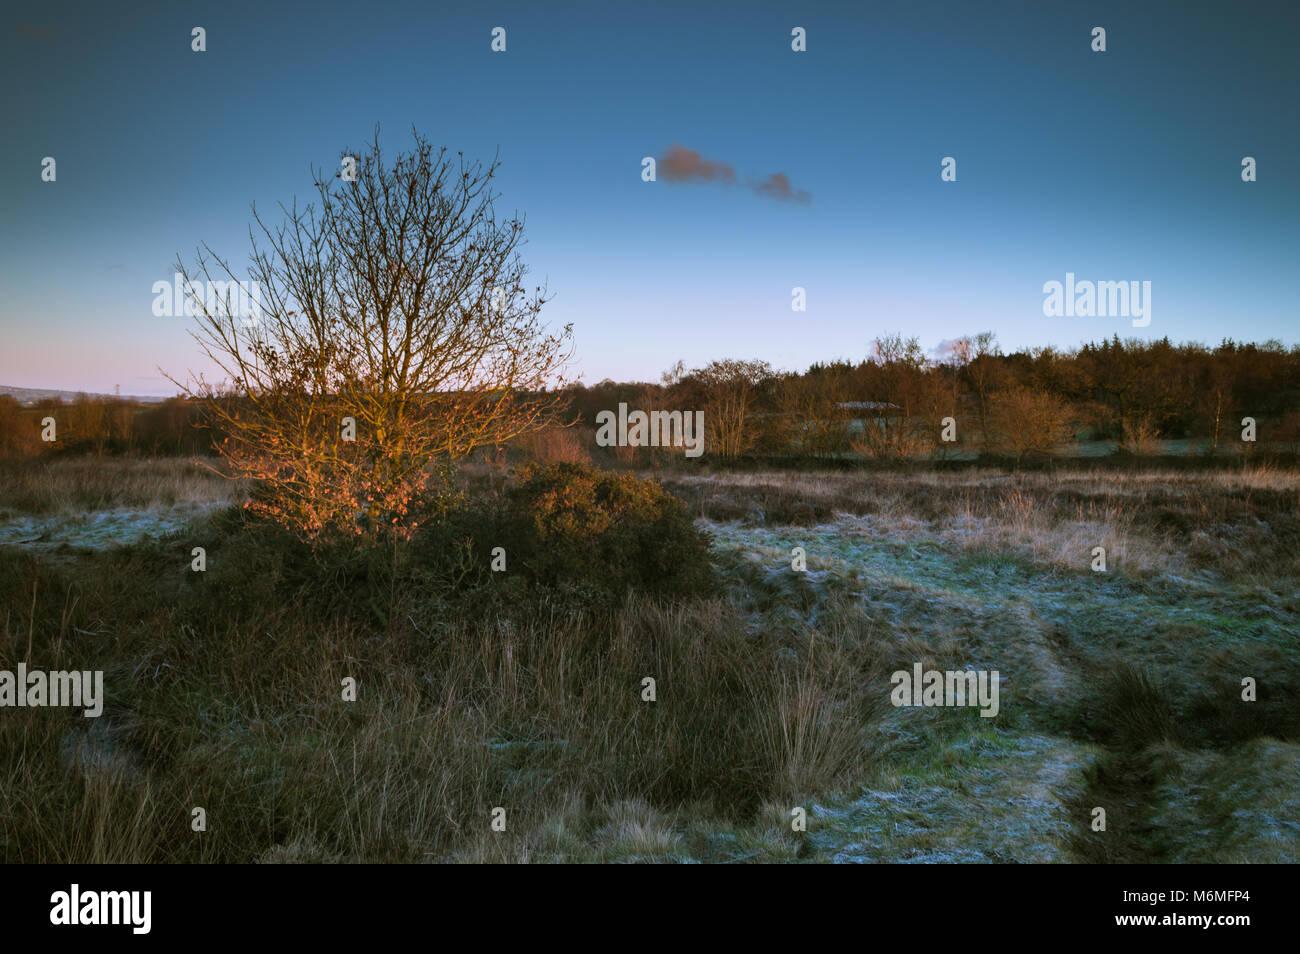 Golden dawn light breaking on a lone tree on a frozen Wetley Moor in Staffordshire. - Stock Image